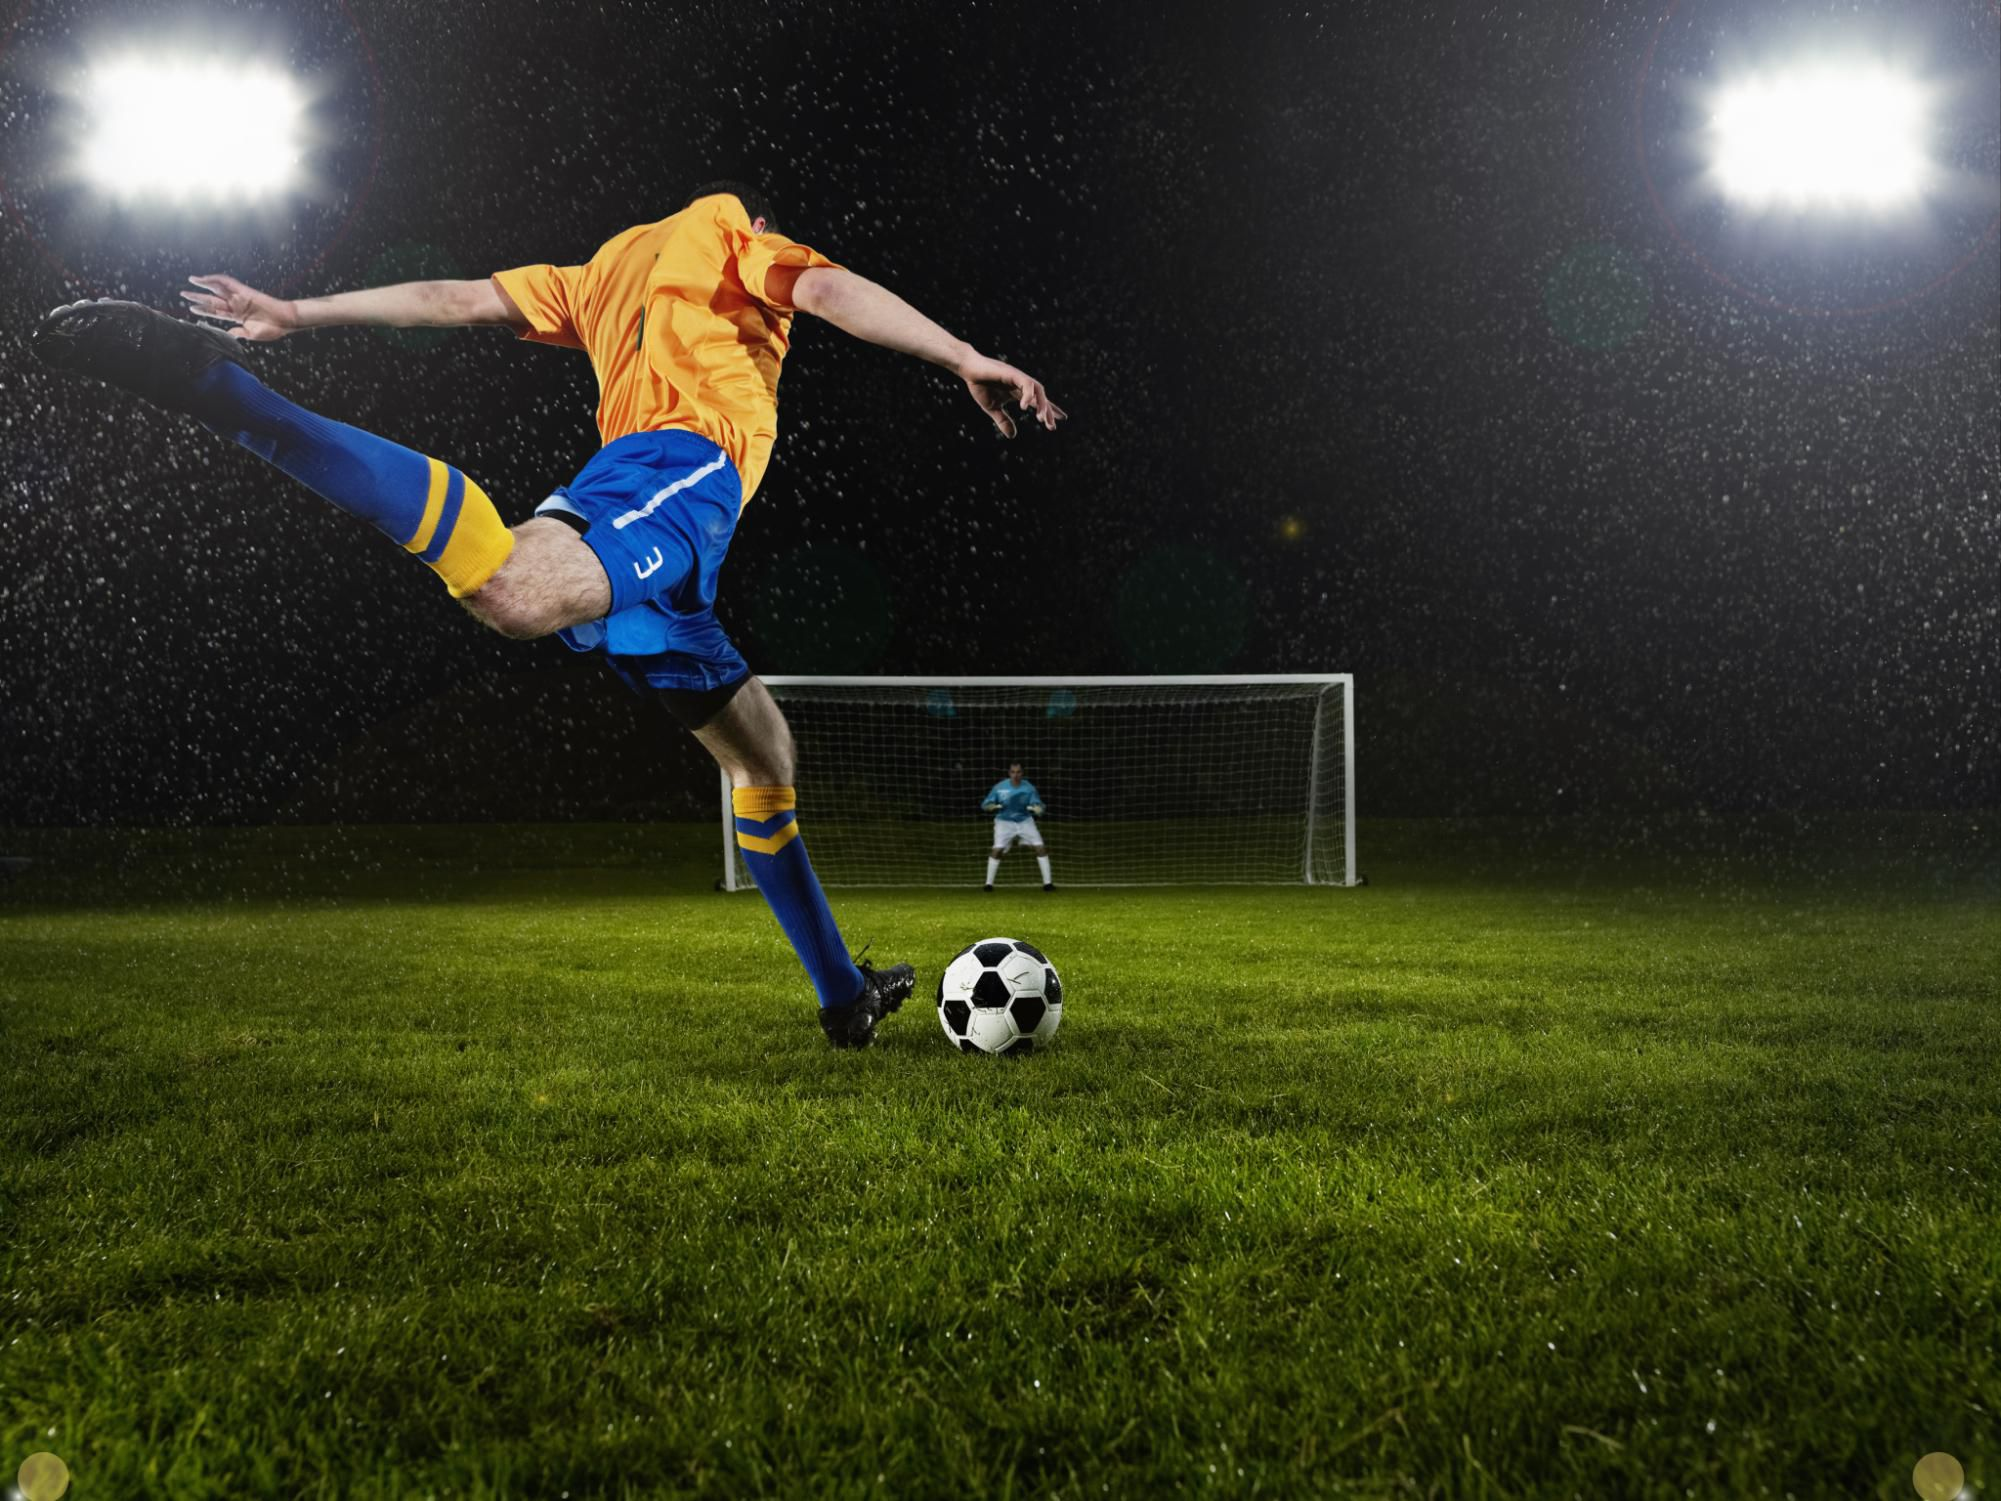 Throw Ins Goal Kicks And Corner Kicks In Soccer